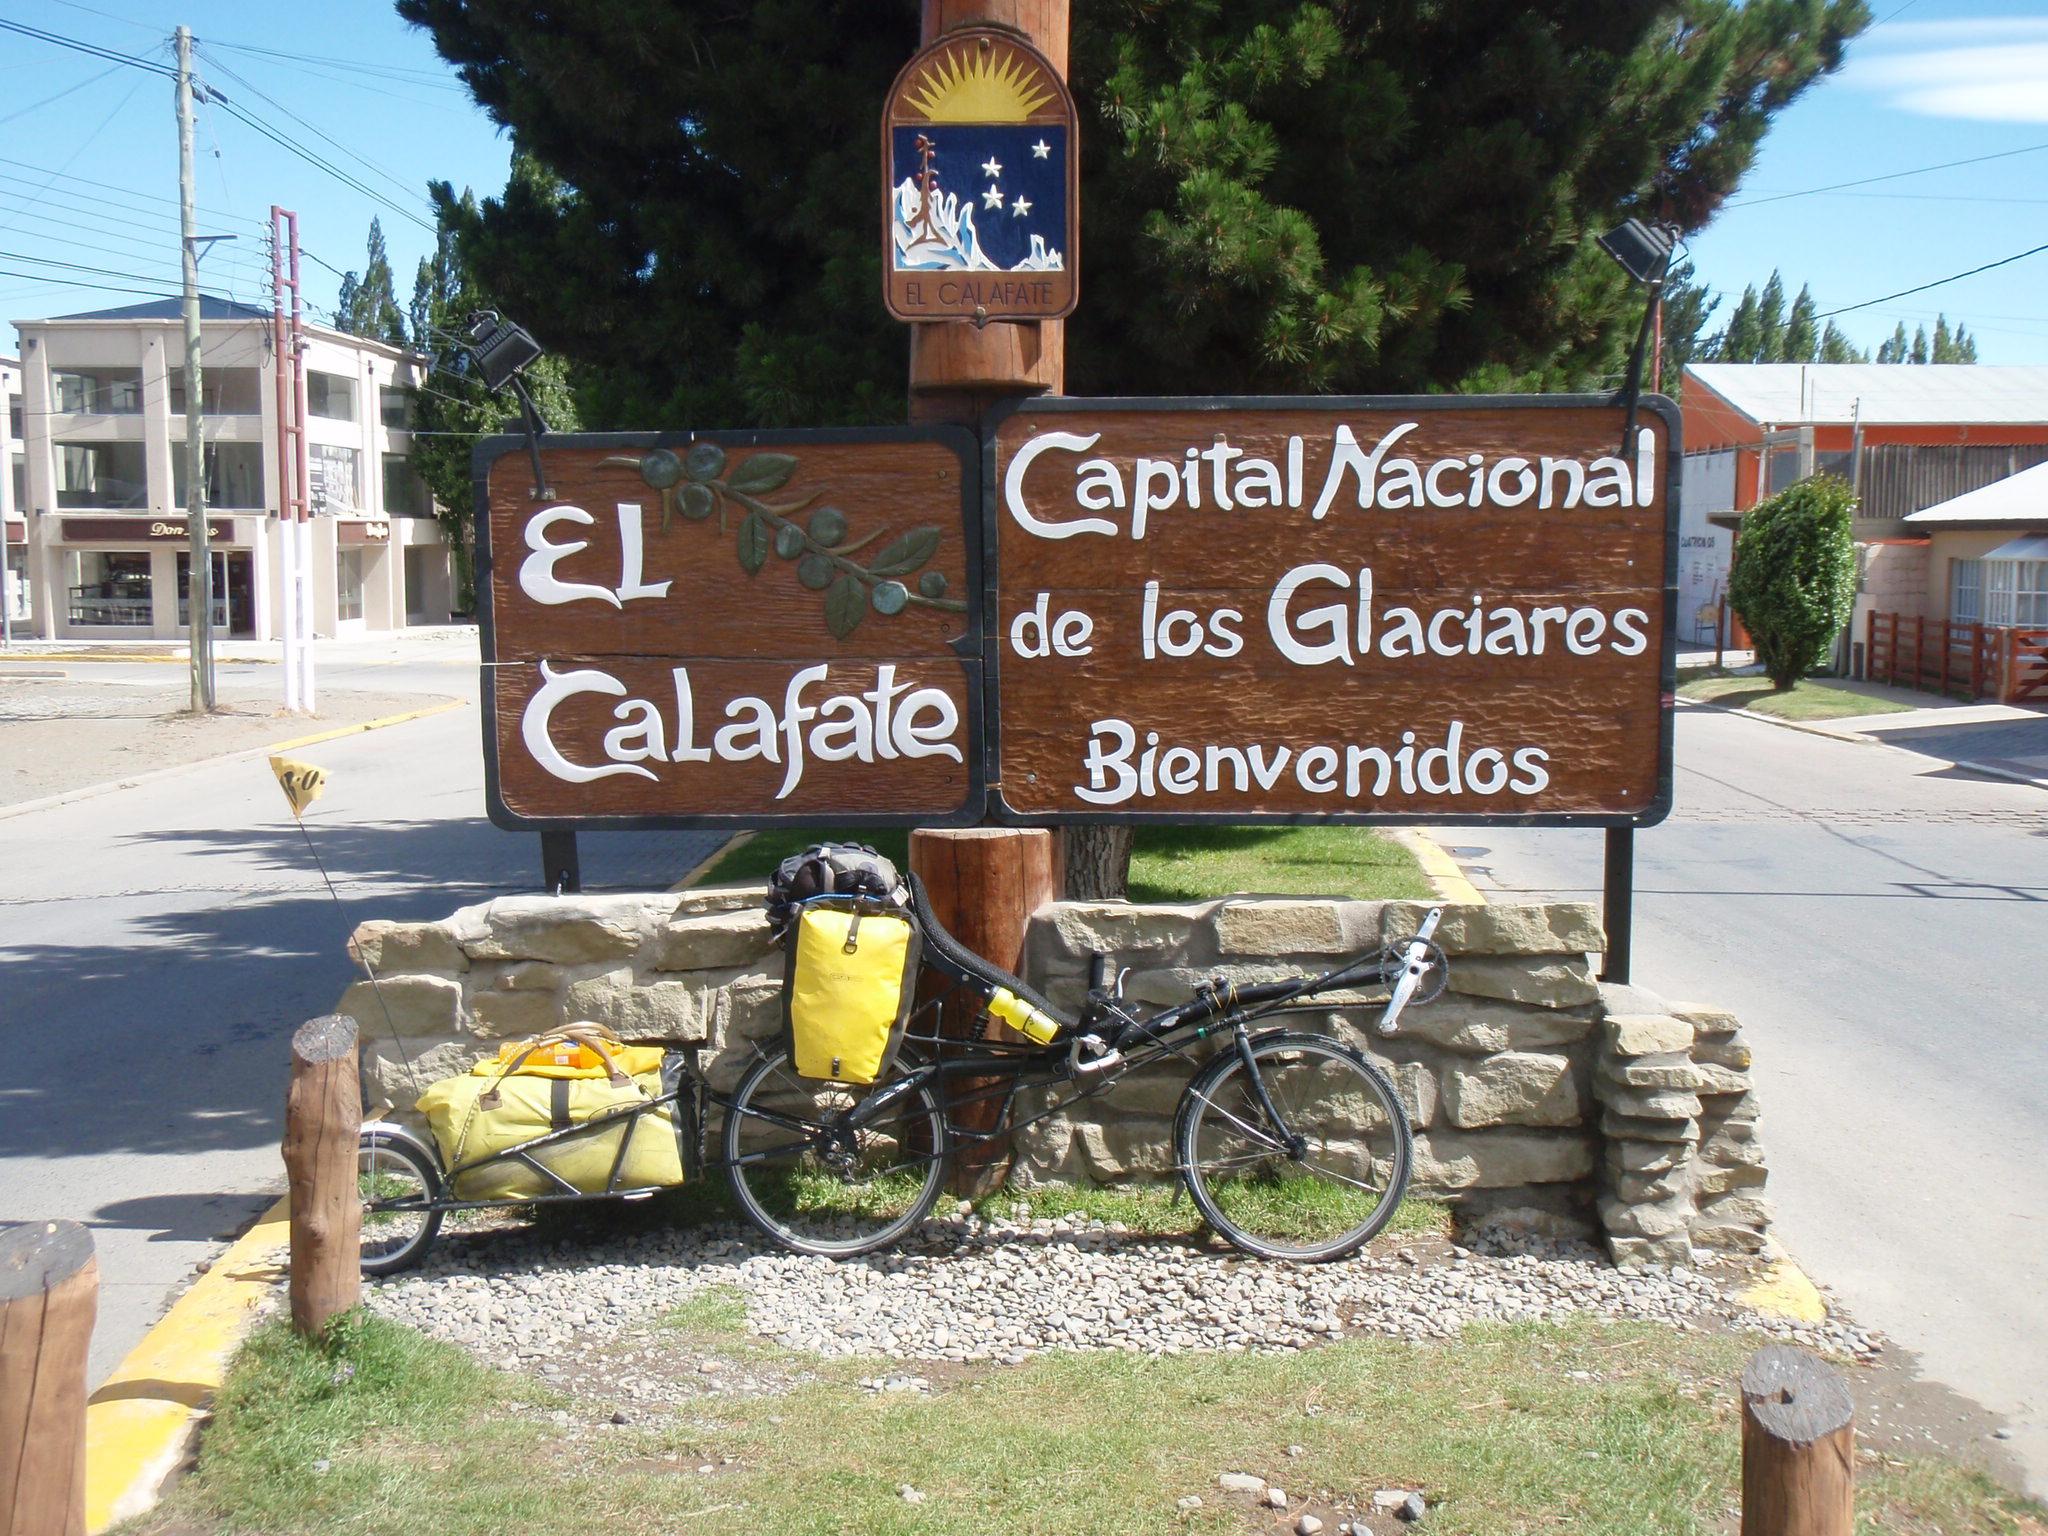 El-Calafate-Argentina-14